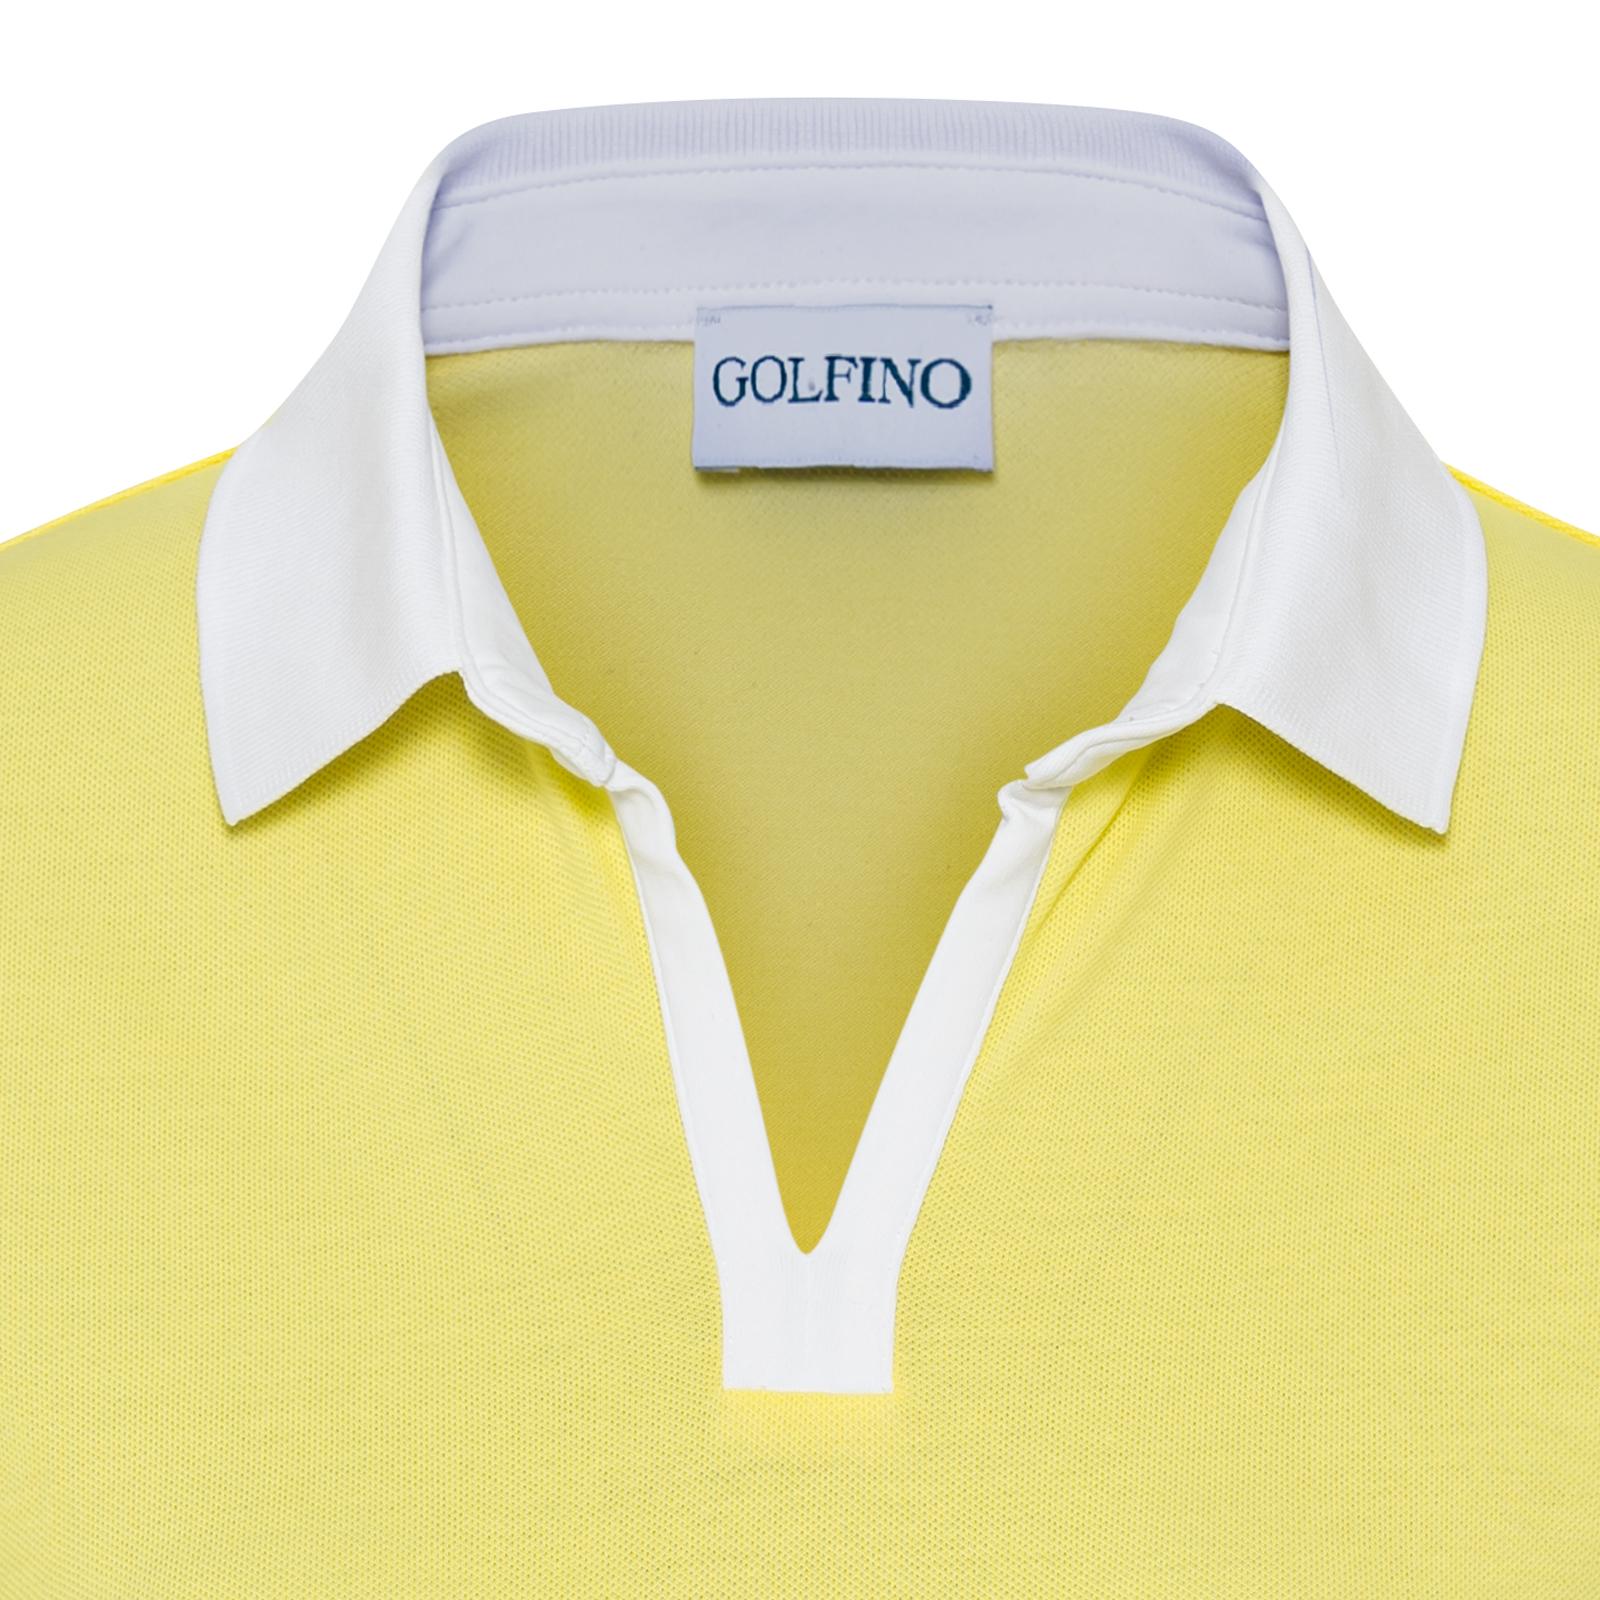 Elastisches Damen Golf Poloshirt